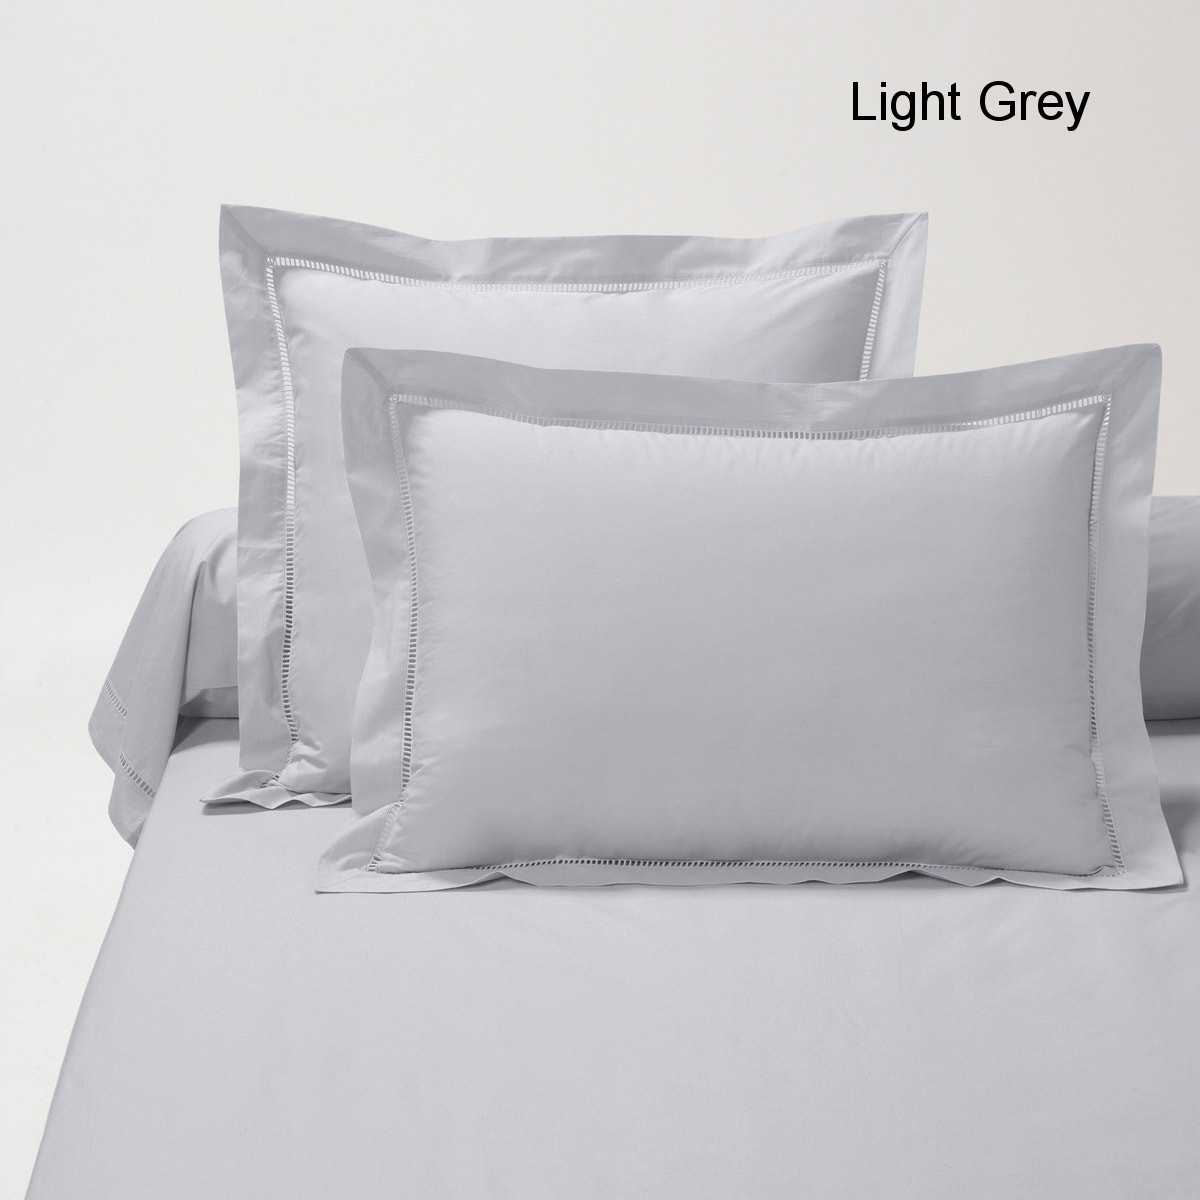 Secret コットンパーケル 枕カバー